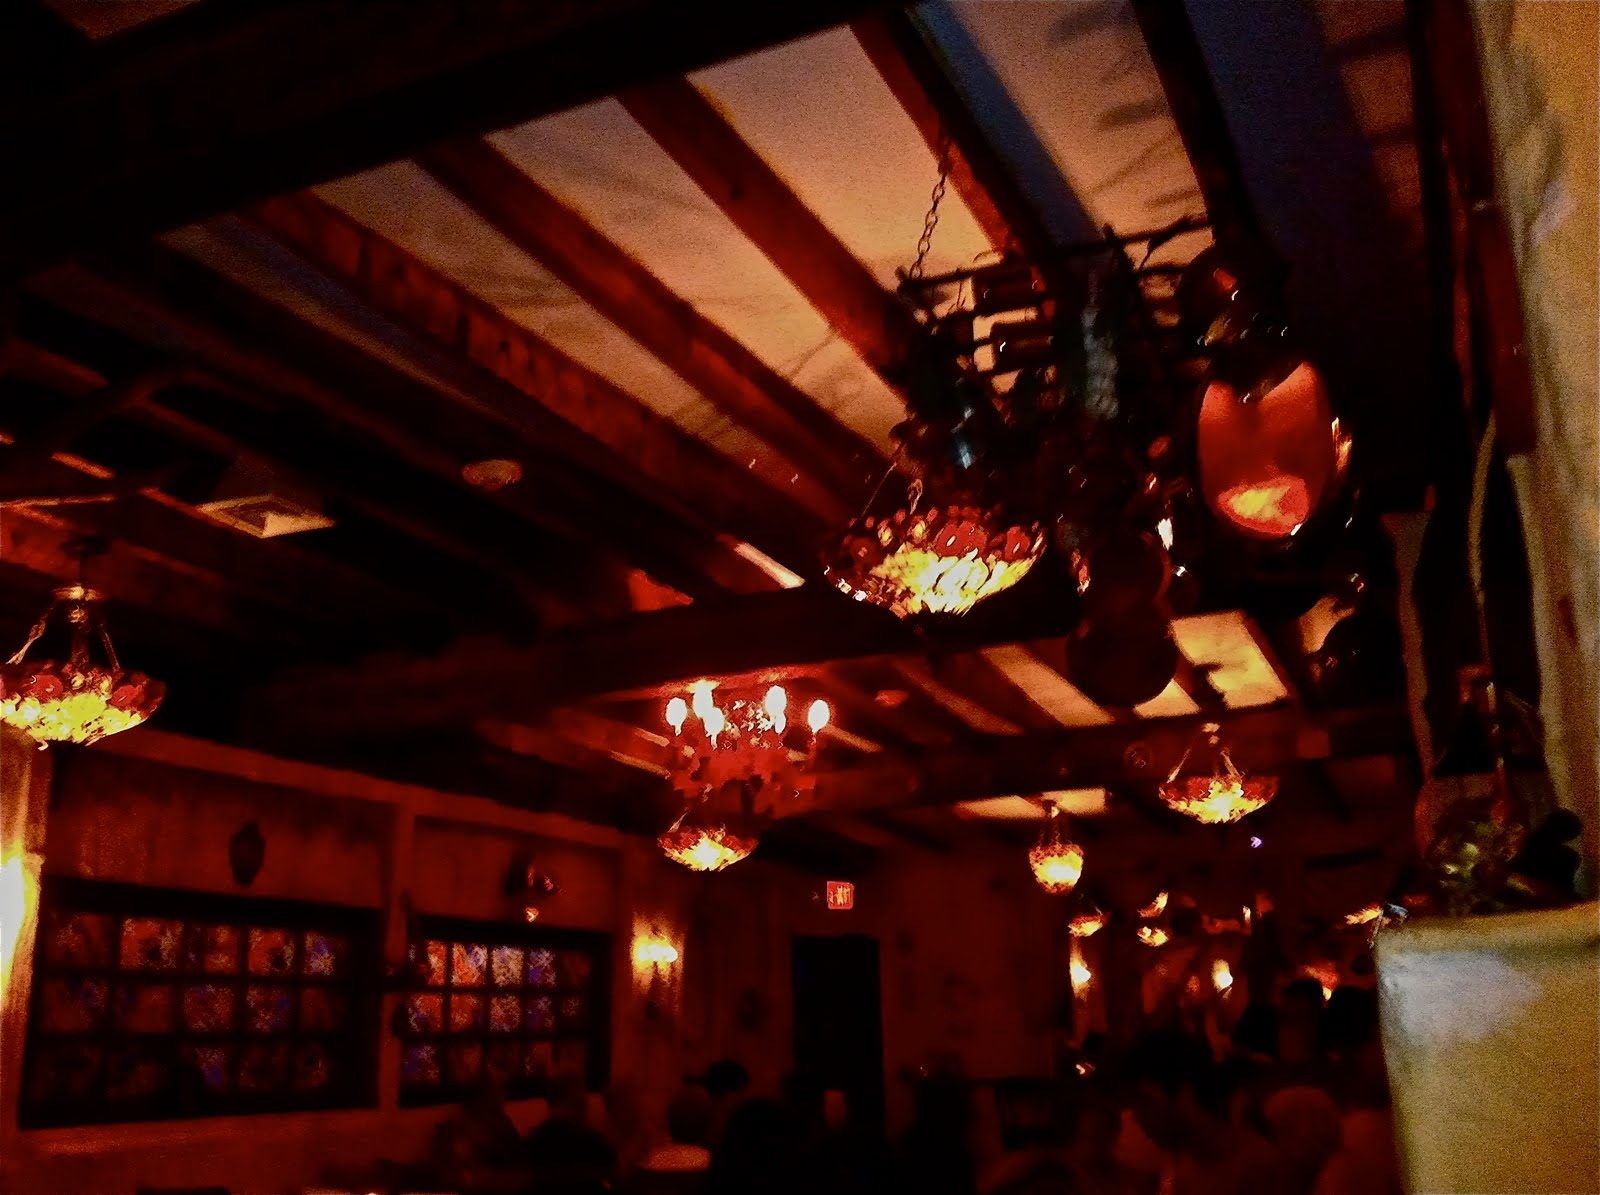 antique table lynn ma DowntownLynn.com: September 2010 antique table lynn ma